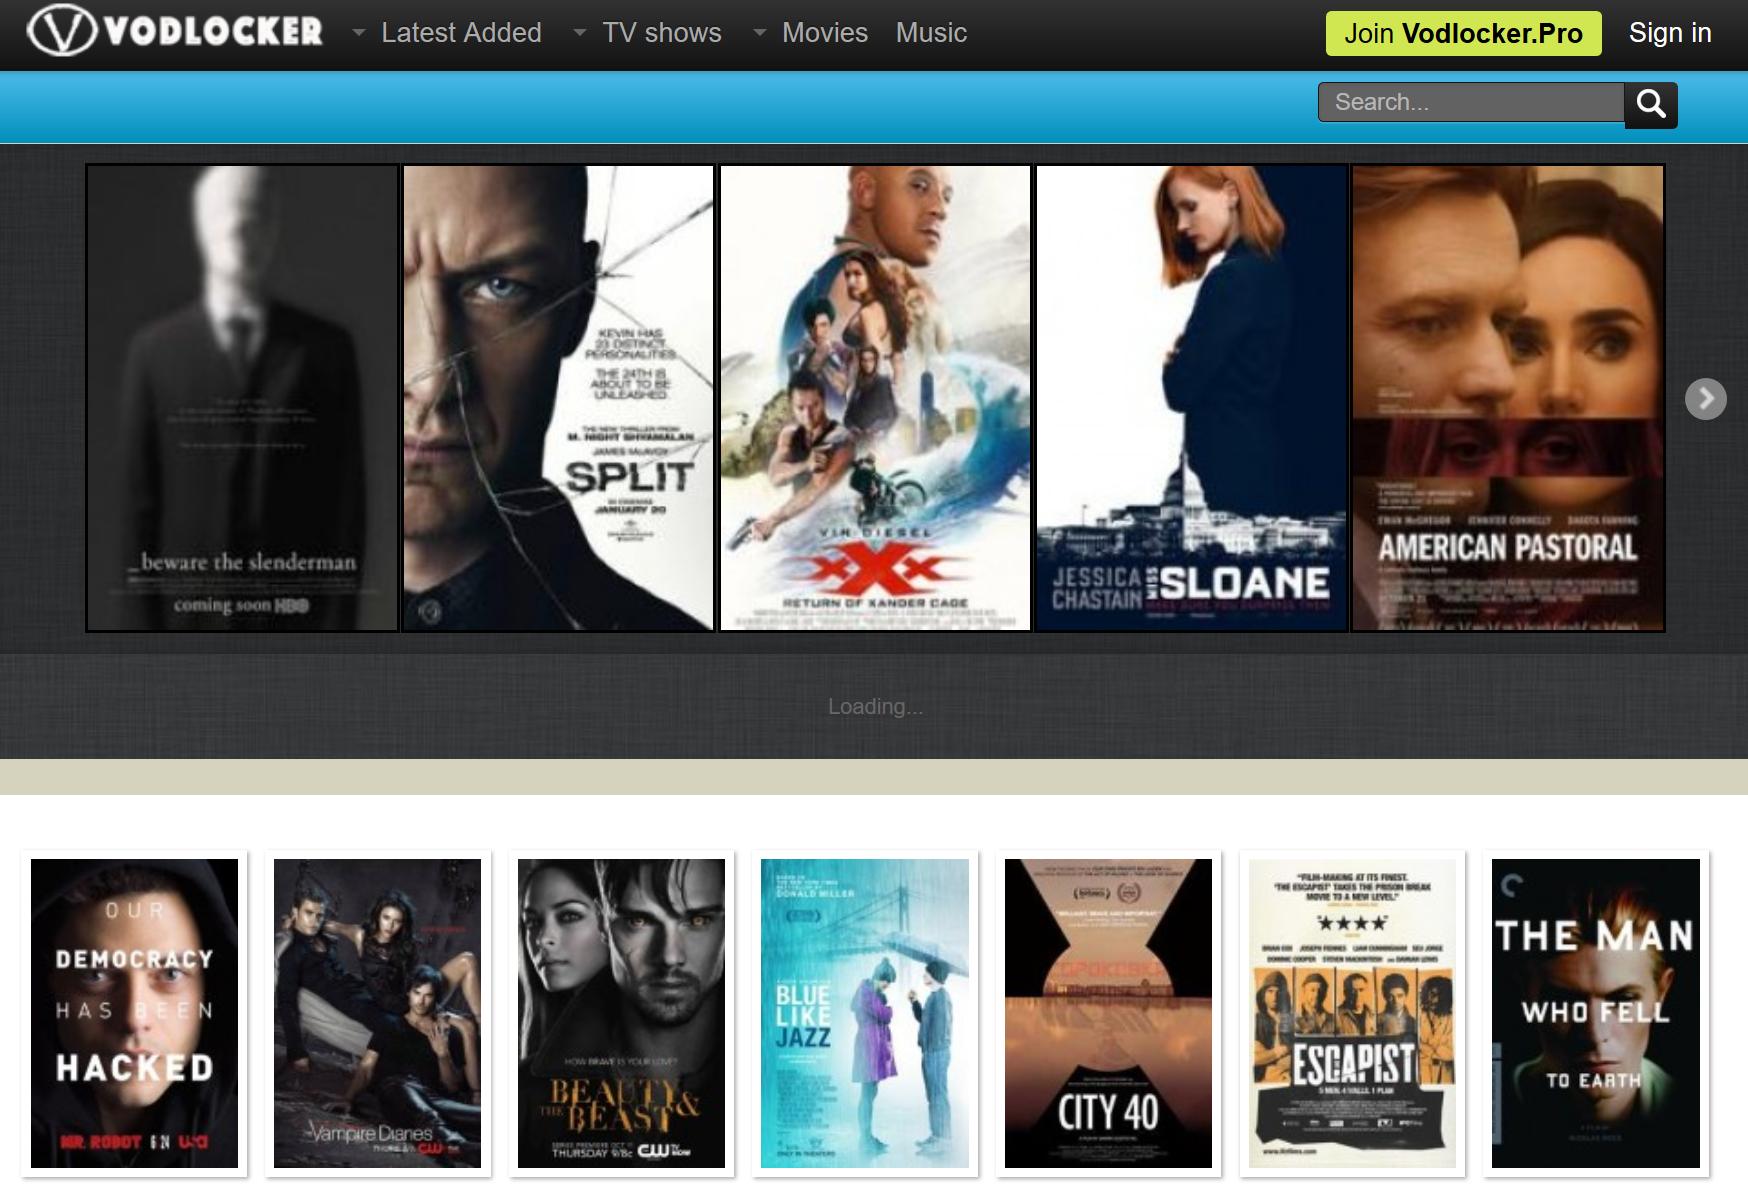 Vodlocker Pro - Ultimate website to watch movies online | Great ...